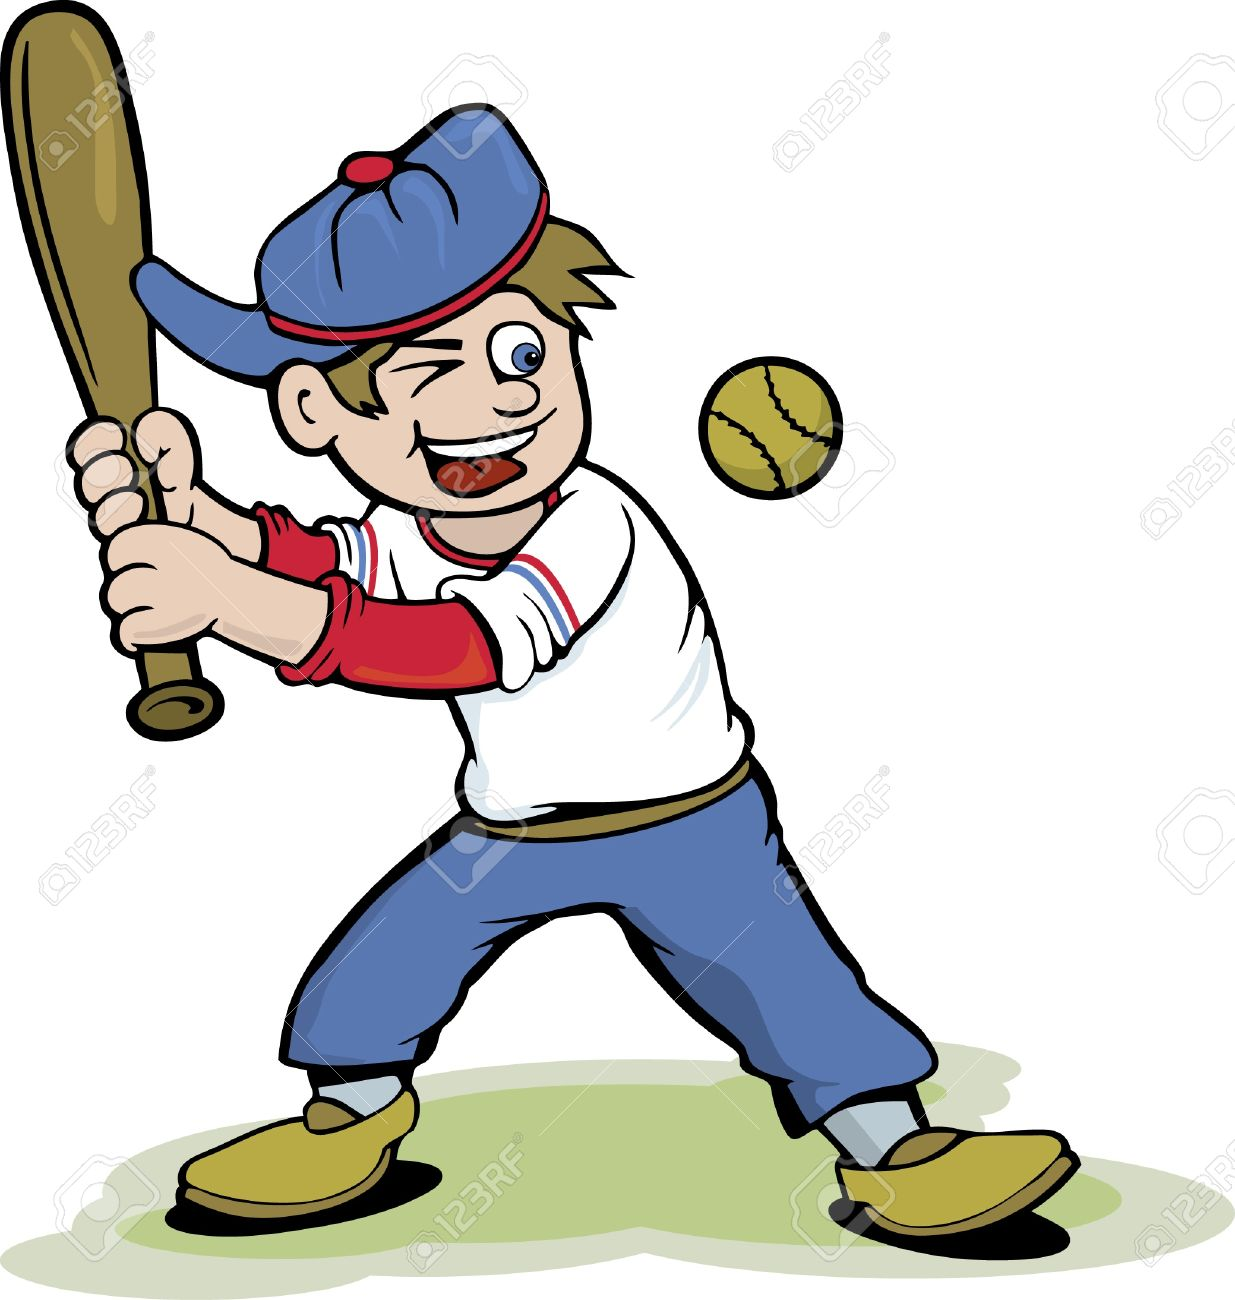 baseball kid cartoon royalty free cliparts vectors and stock rh 123rf com Basketball Vector Baseball Diamond Vector